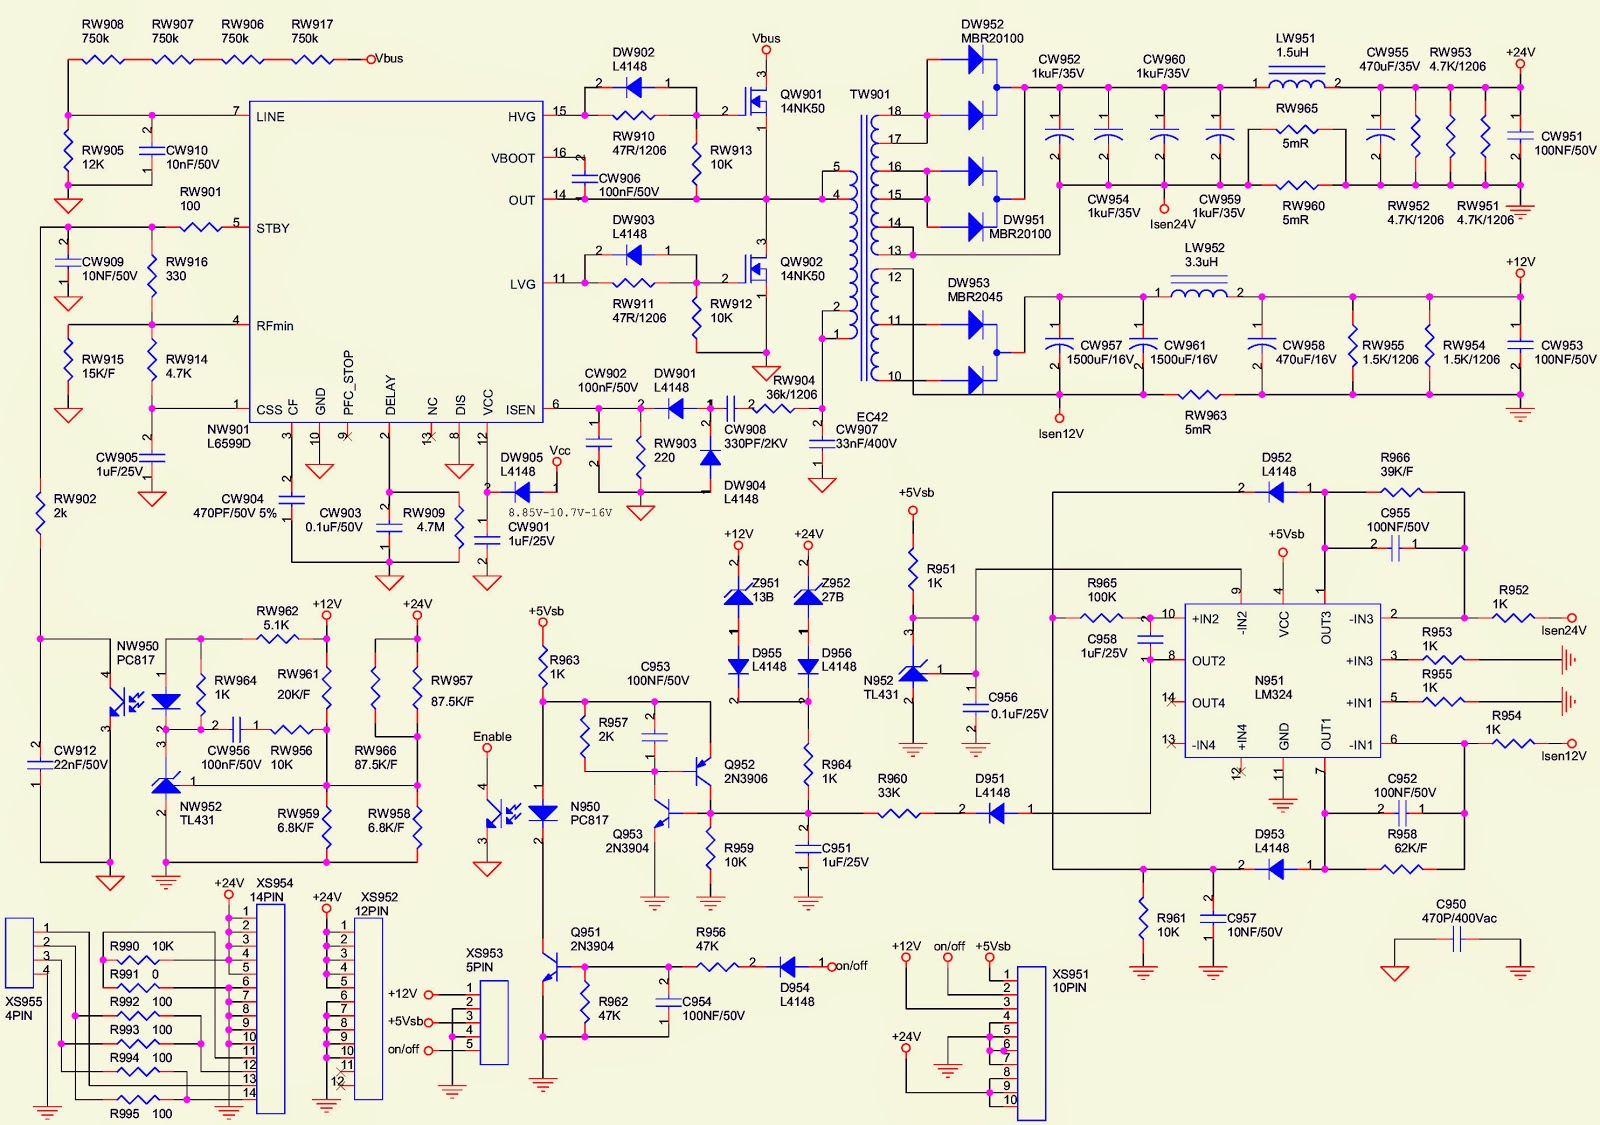 datatool system 3 wiring diagram 2001 nissan xterra stereo gast model moa p129 hb 37